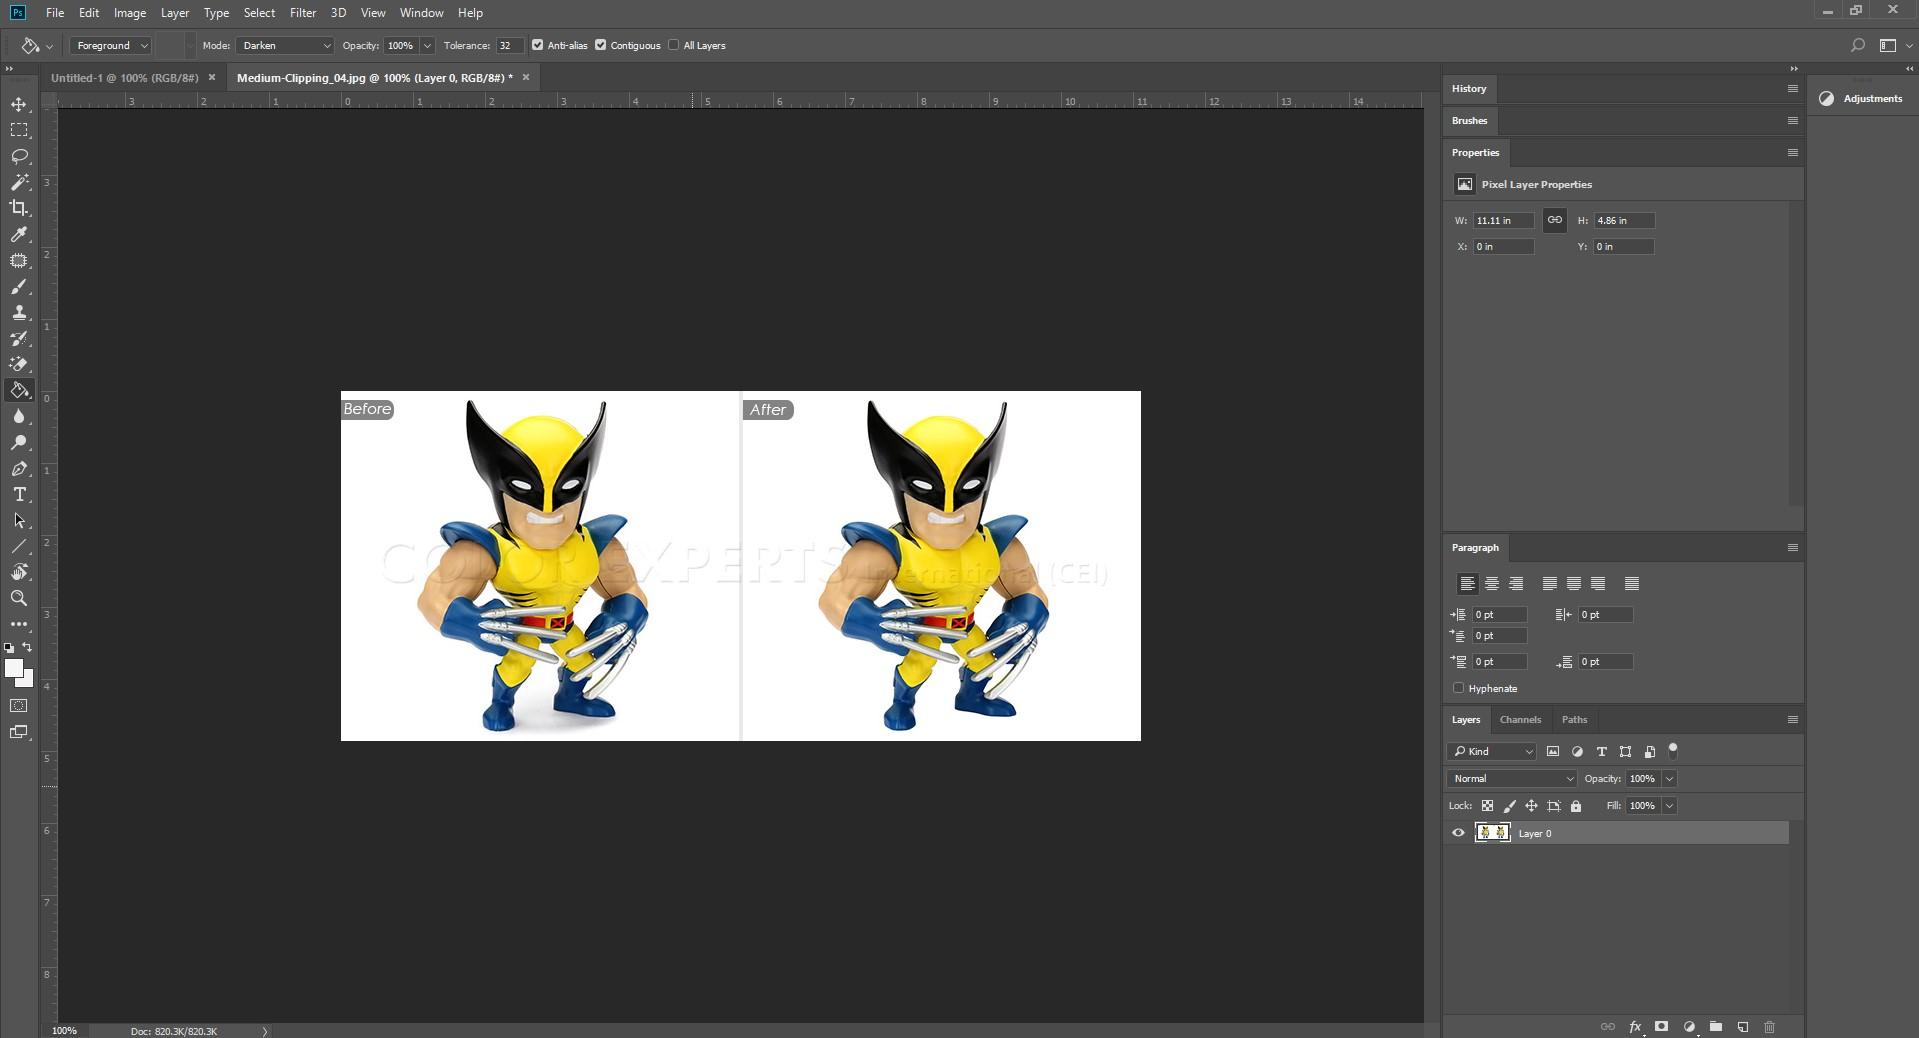 Image 1-how to remove watermark Photoshop